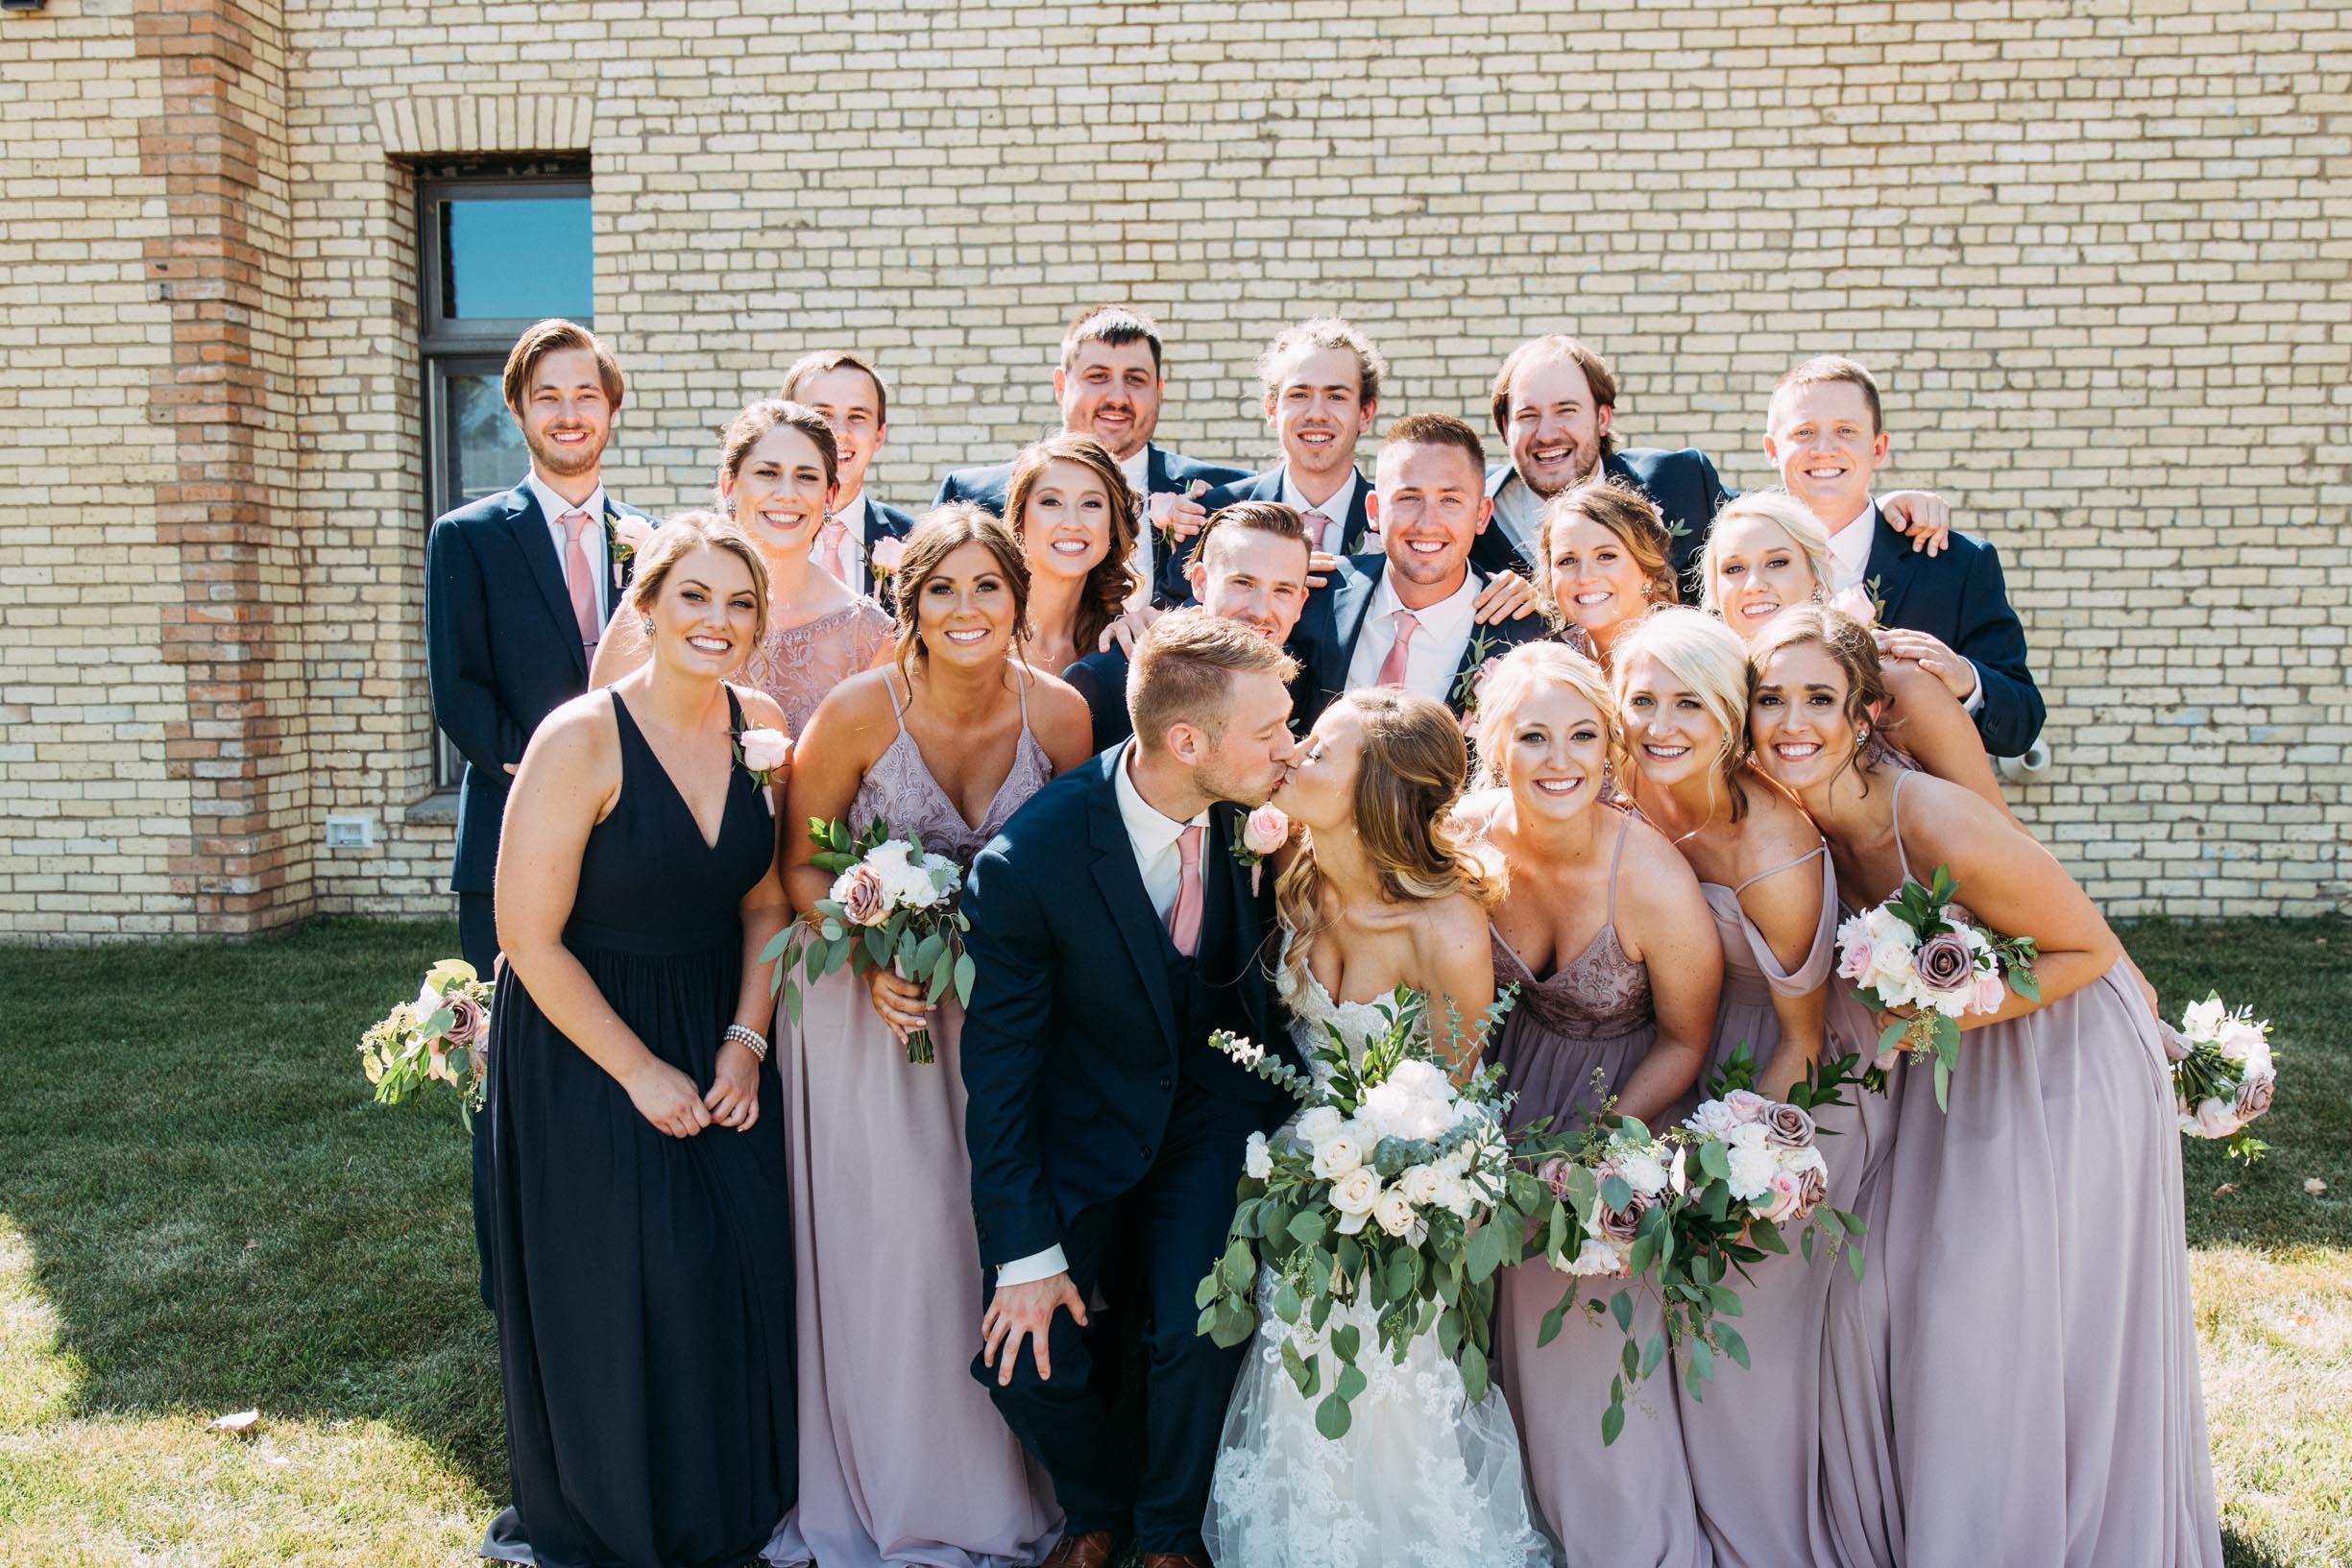 47-WeddingsattheBroz_Minnesota_WeddingBlog_WeddingParty.jpg